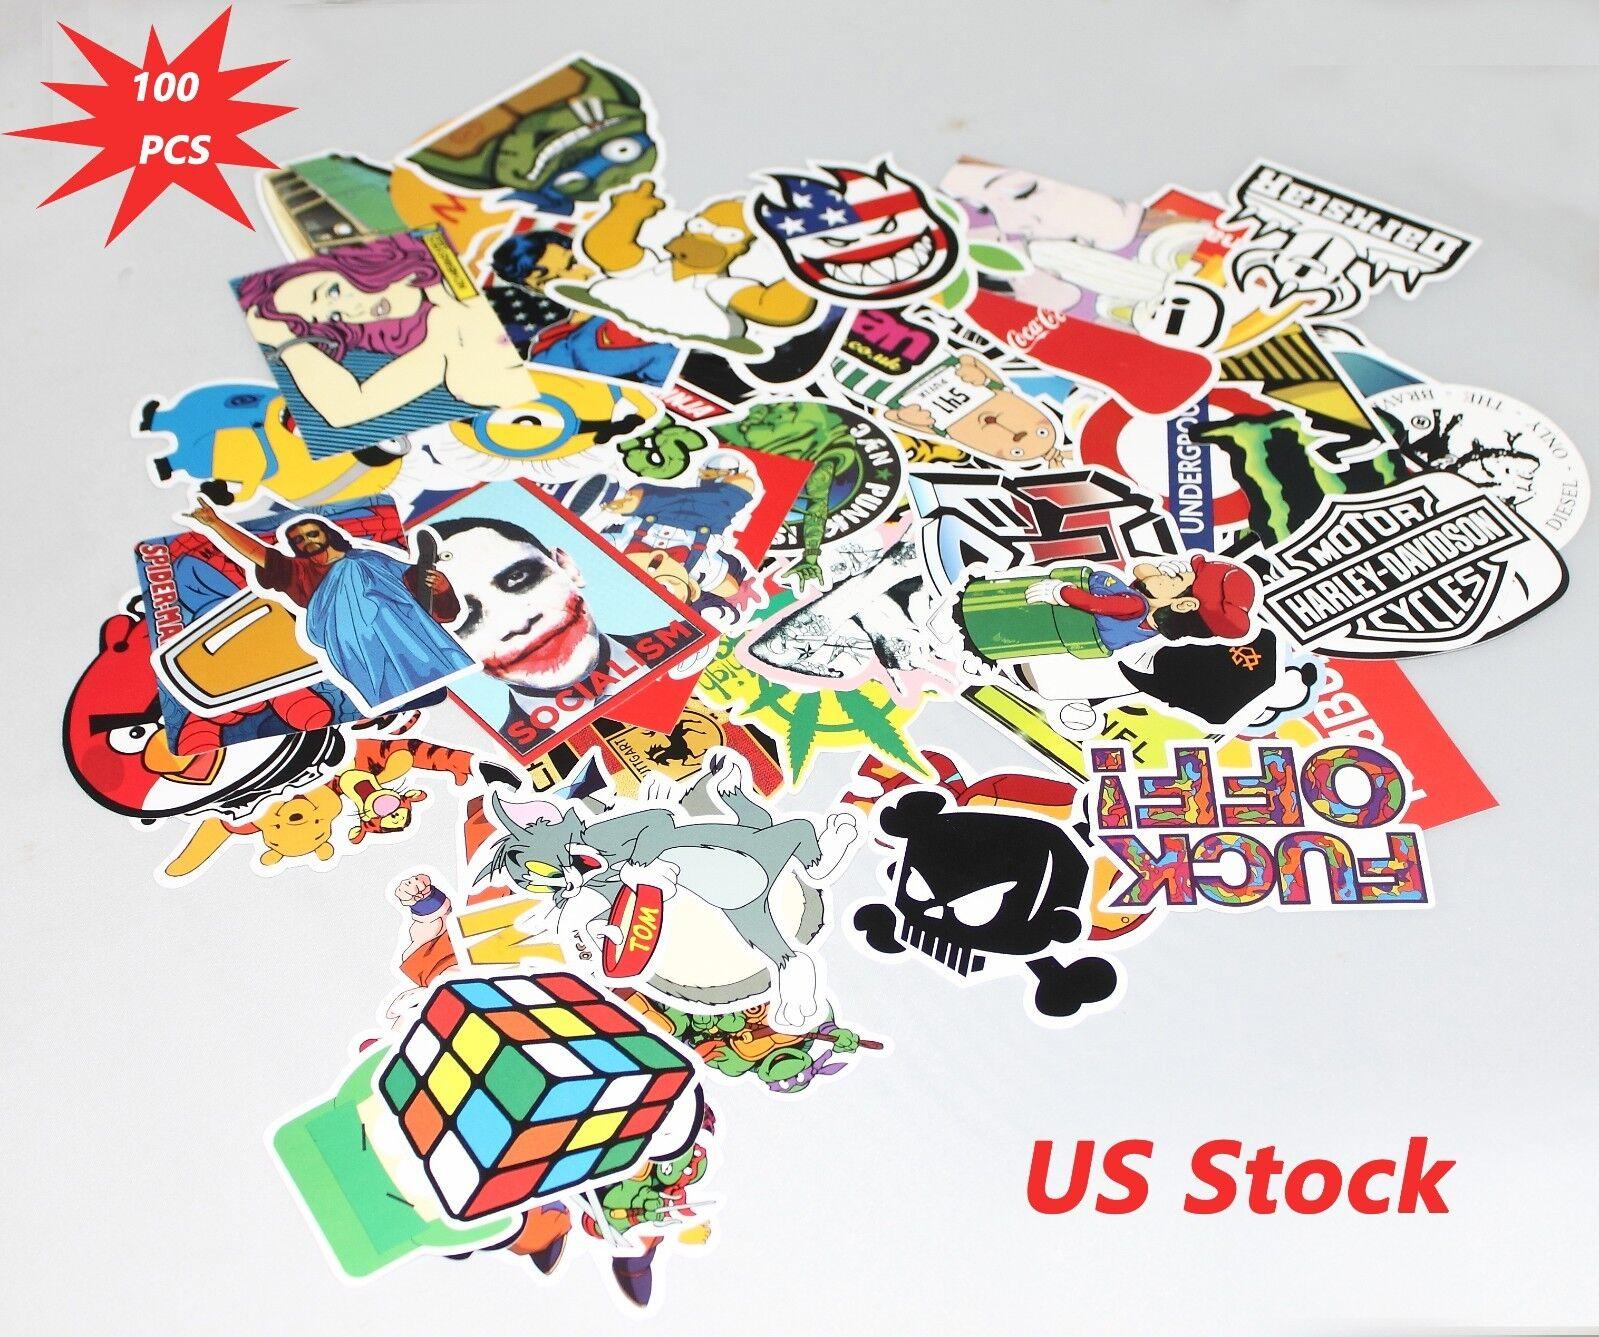 100pcs//lot Sticker Bomb Graffiti Vinyl Car Skate Skateboard Laptop Luggage Decal